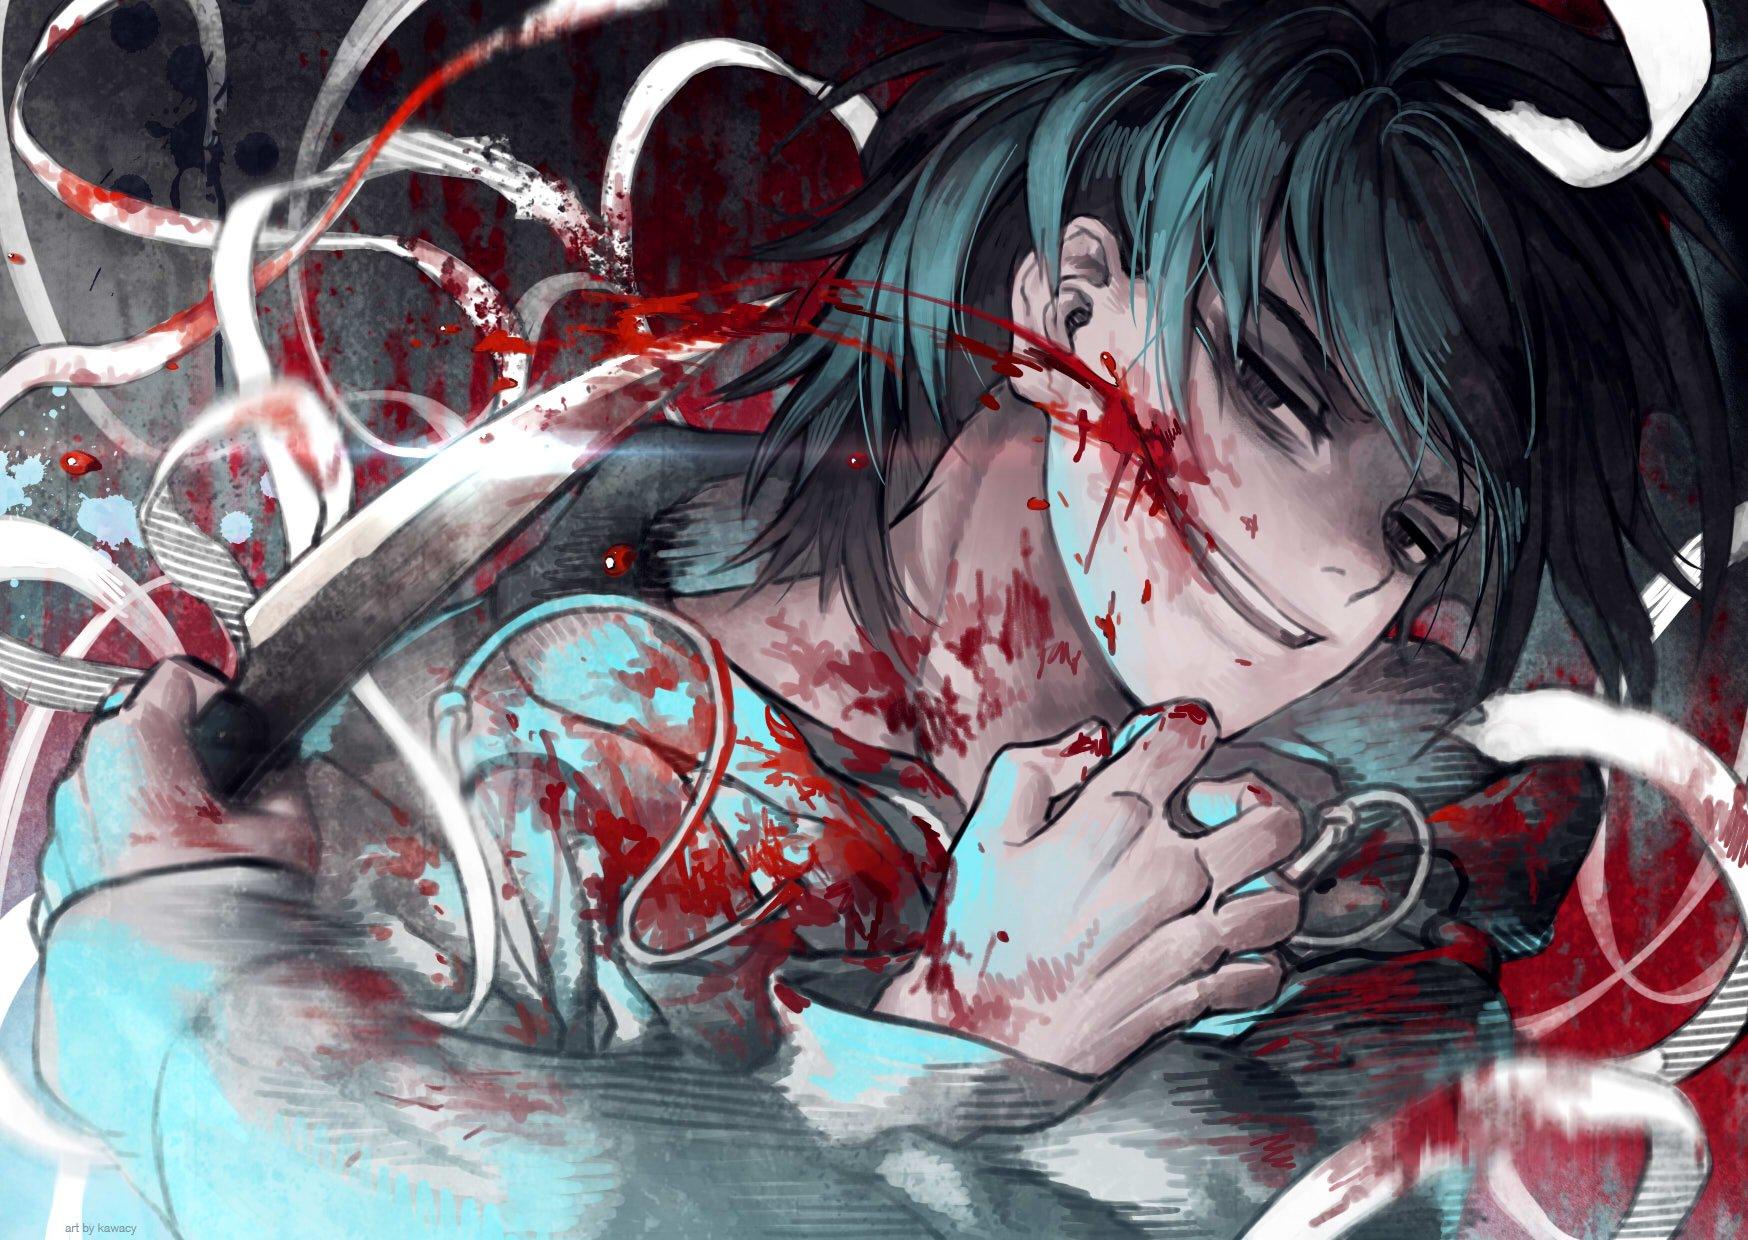 Jeff the killer anime wallpaper | 1748x1240 | 835338 ... Hd Wallpapers 1920x1080 Anime